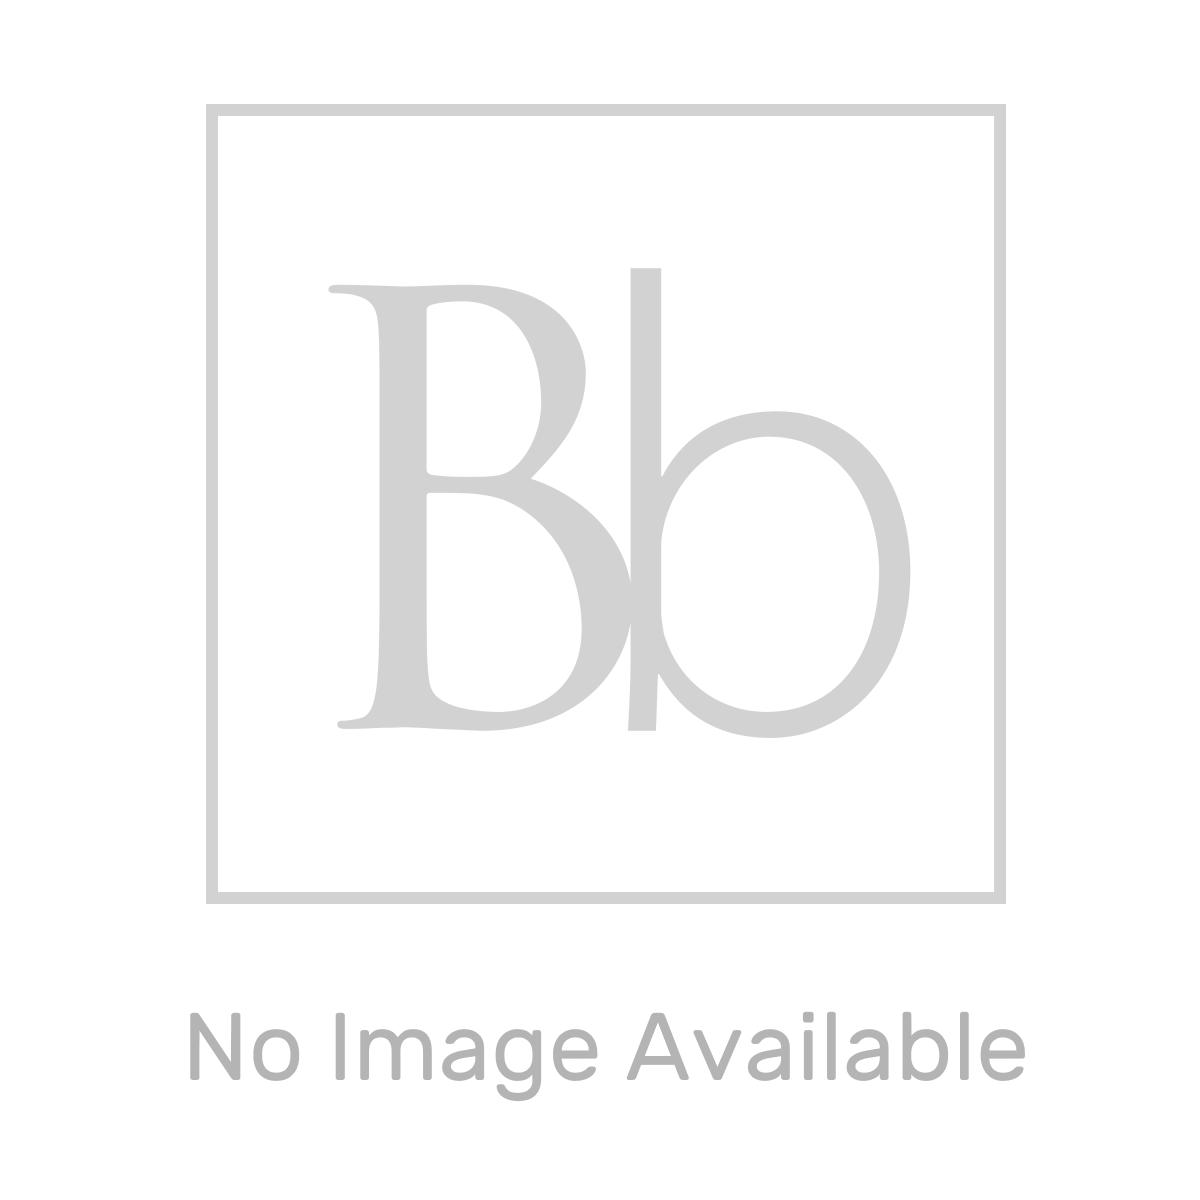 Frontline Alex Designer Heated Towel Rail